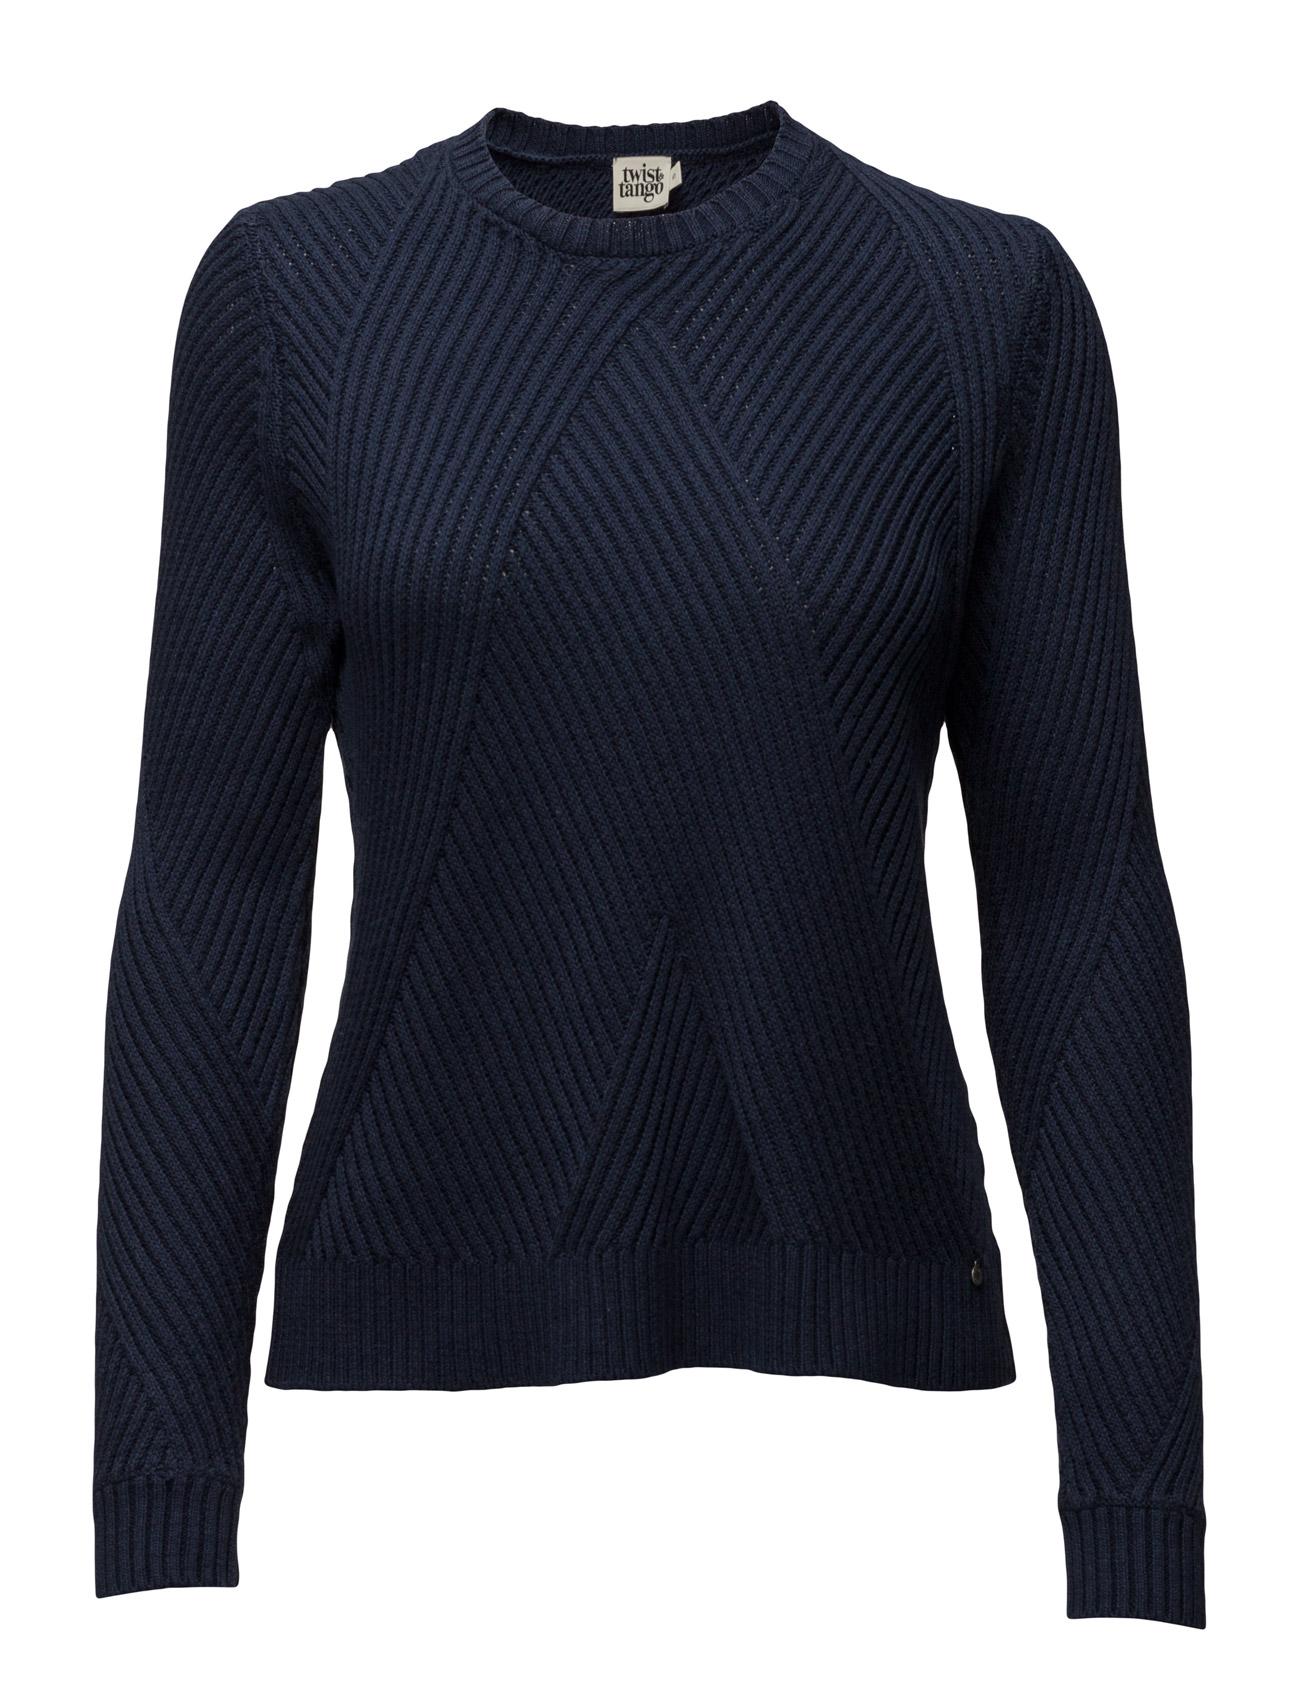 Sadieweater Dark Blue Twist & Tango Sweatshirts til Damer i Mørkeblå